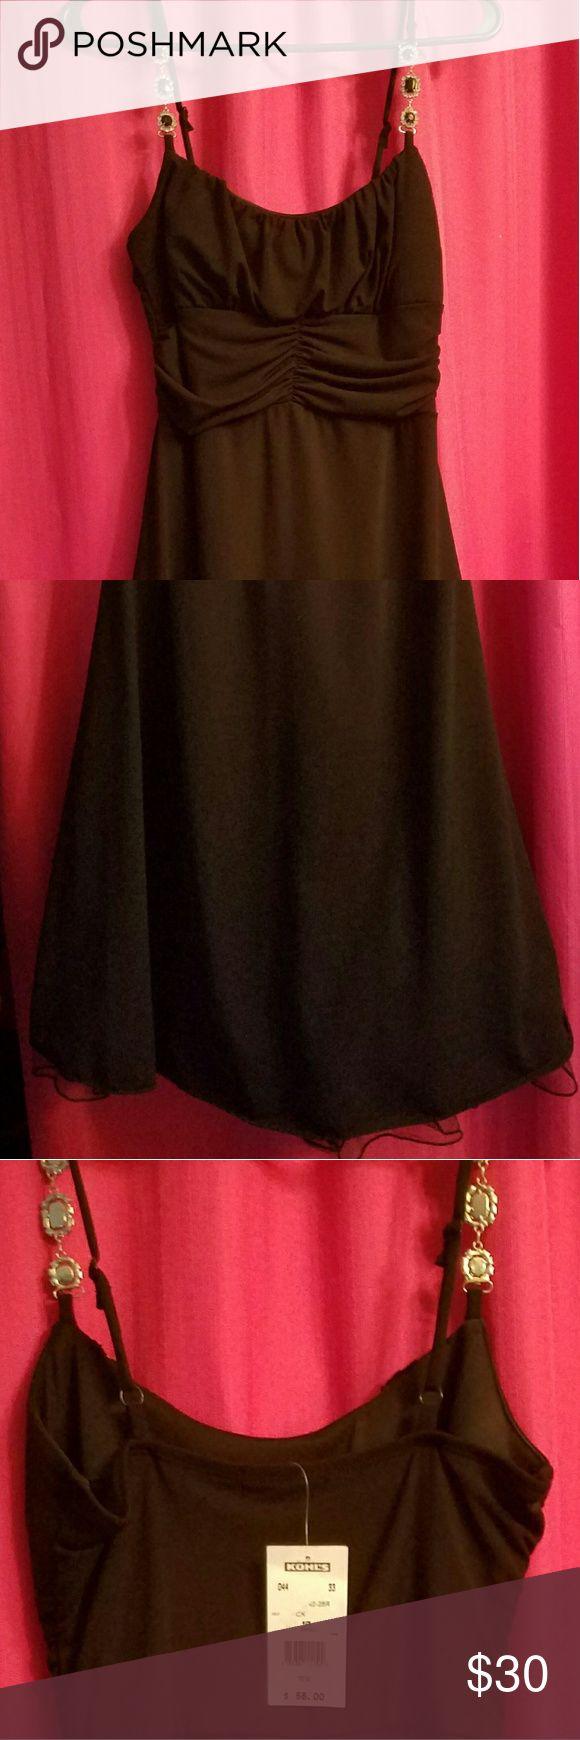 Black spaghetti strap Dress Black spaghetti strap Dress. Size small. Adjustable straps. Bought from Kohl's. Never worn. Dresses Midi